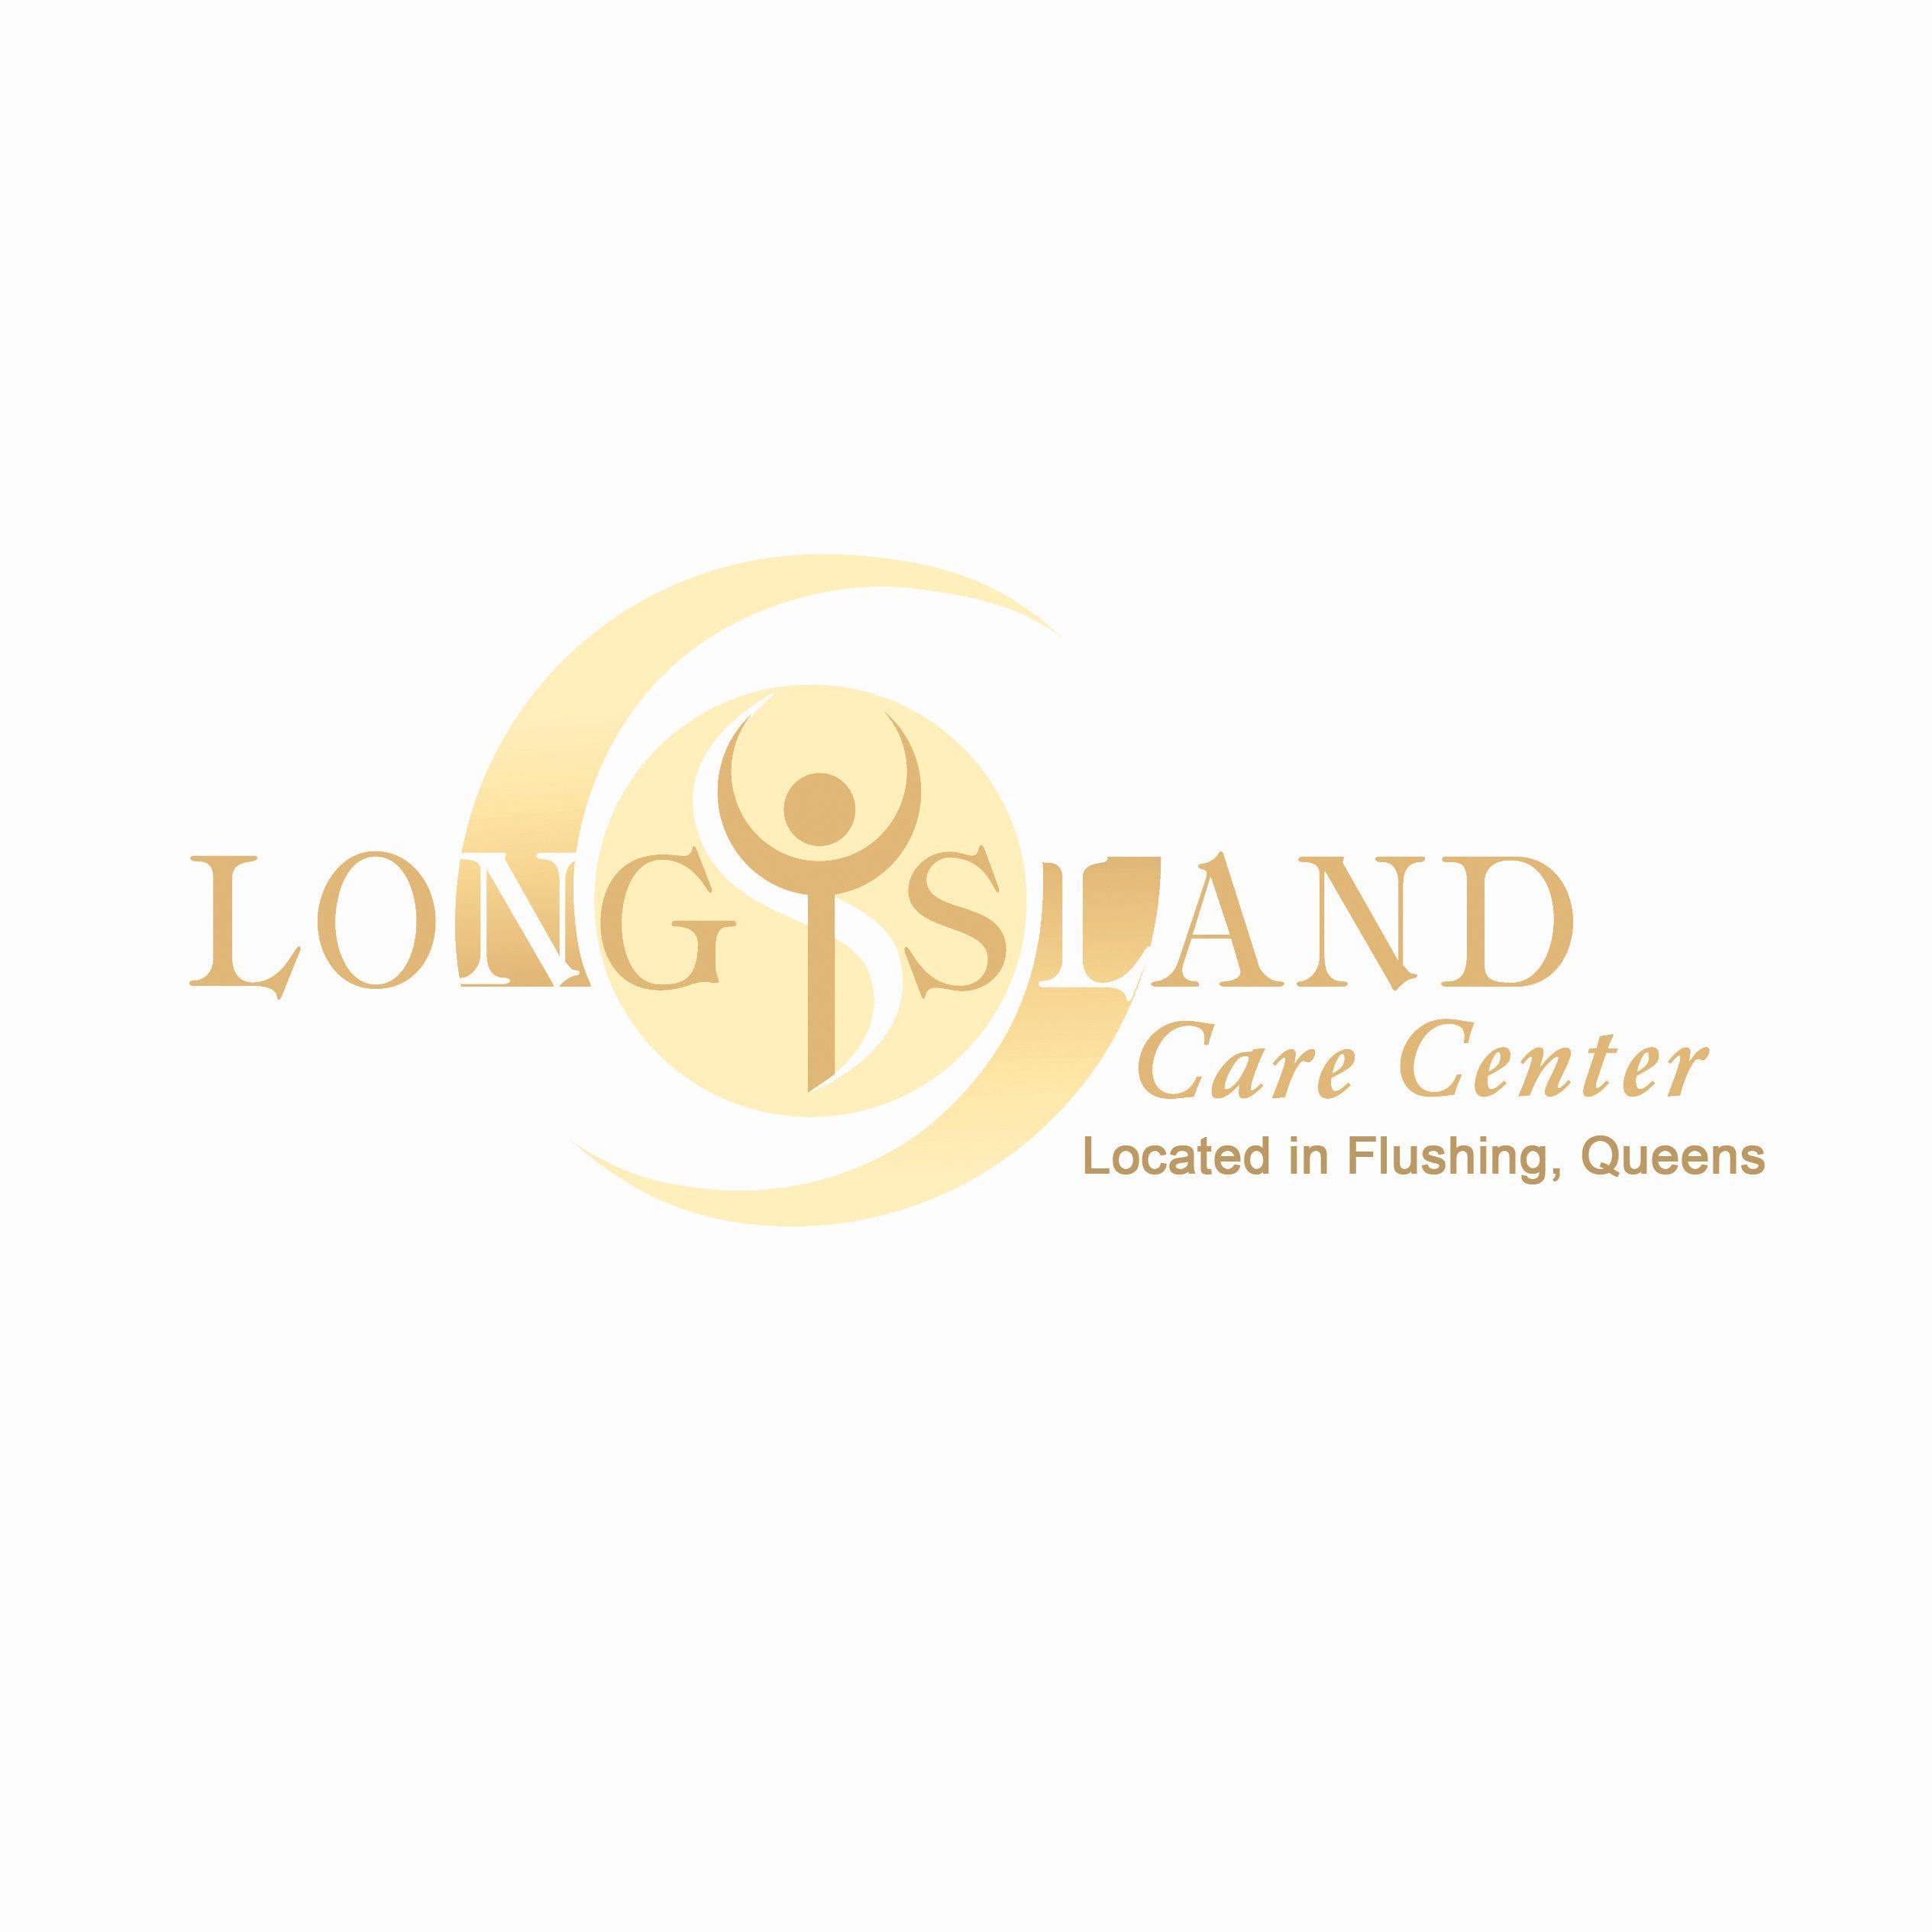 Long Island Care Center